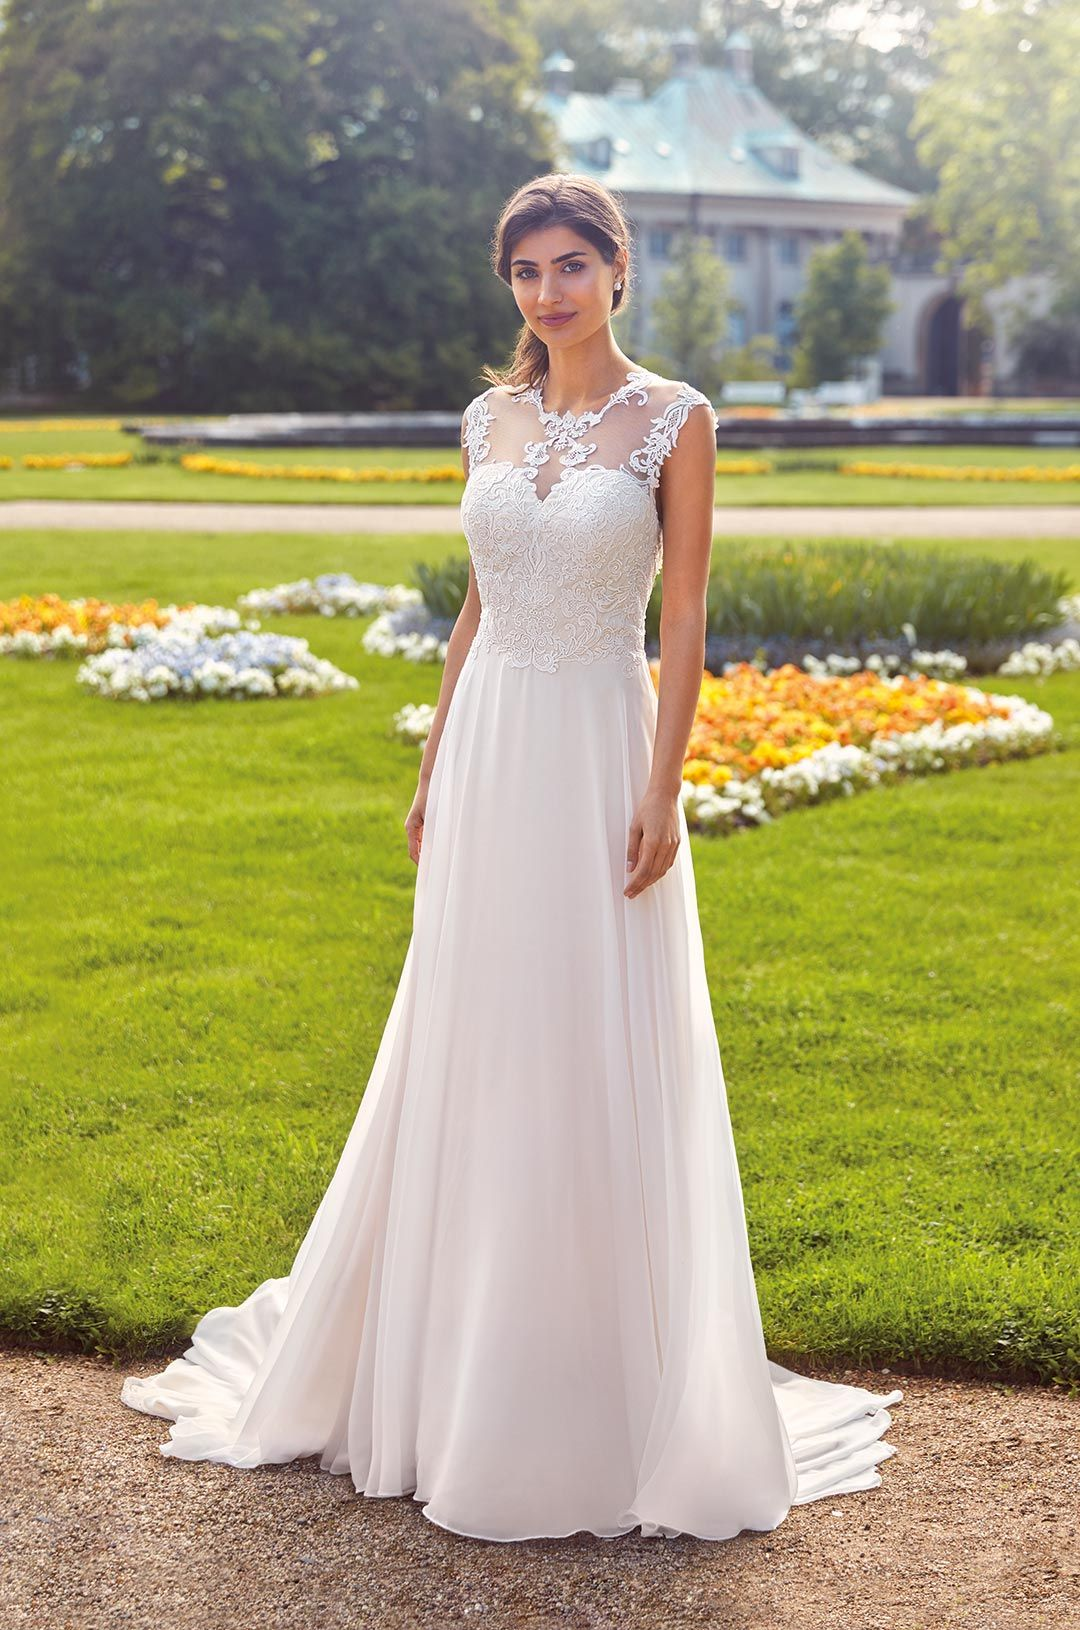 Brautkleid Indila by KLEEMEIER, Kollektion 19, Hochzeitskleid